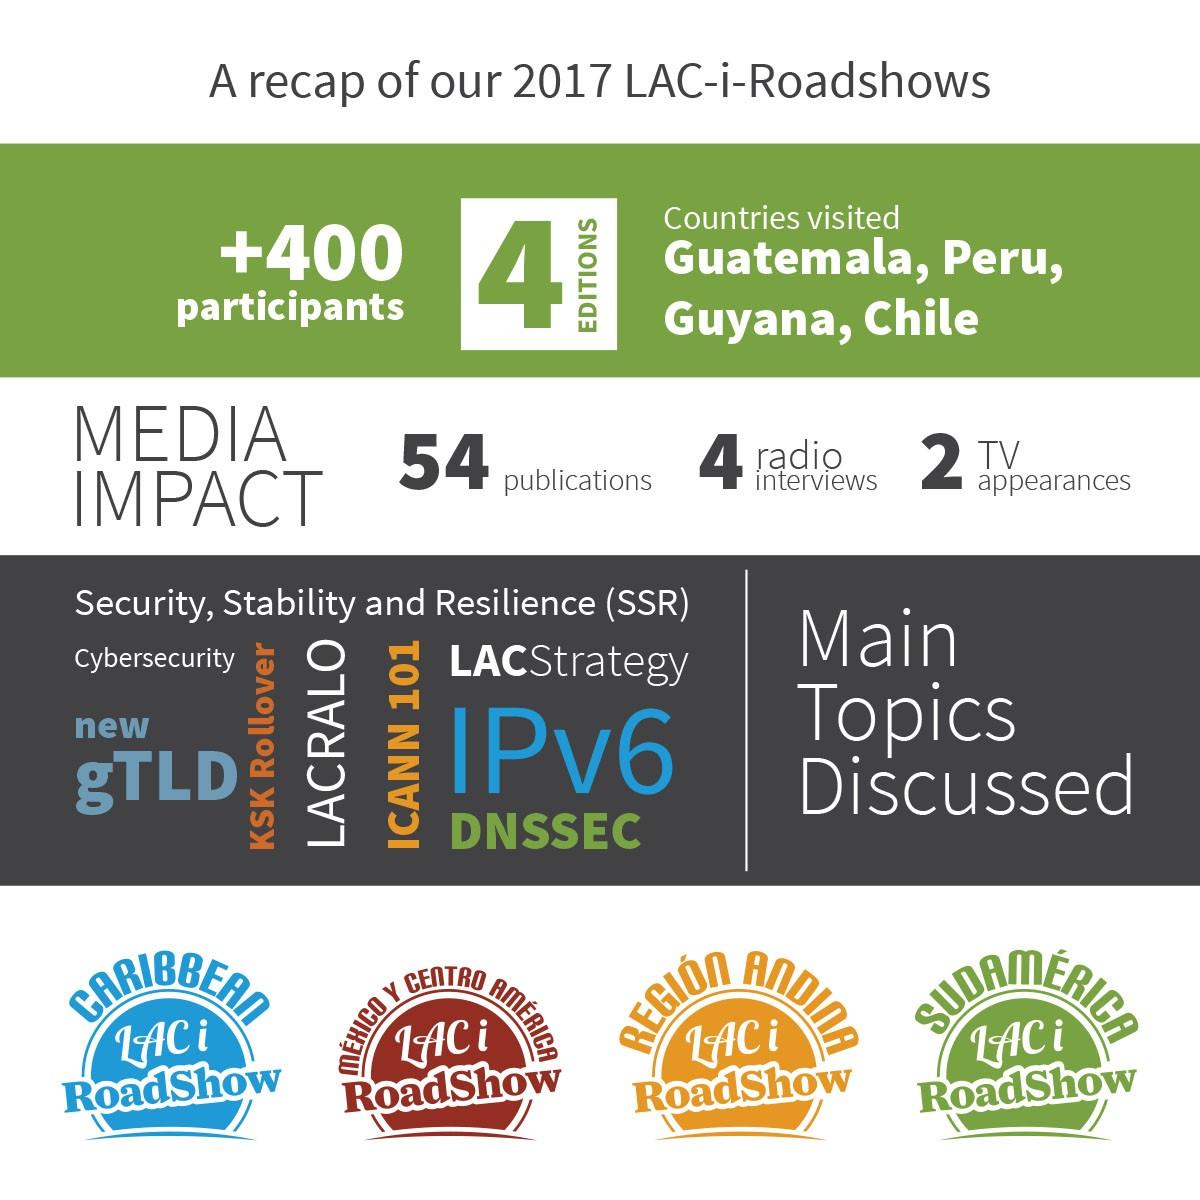 A recap of our 2017 LAC-i-Roadshows